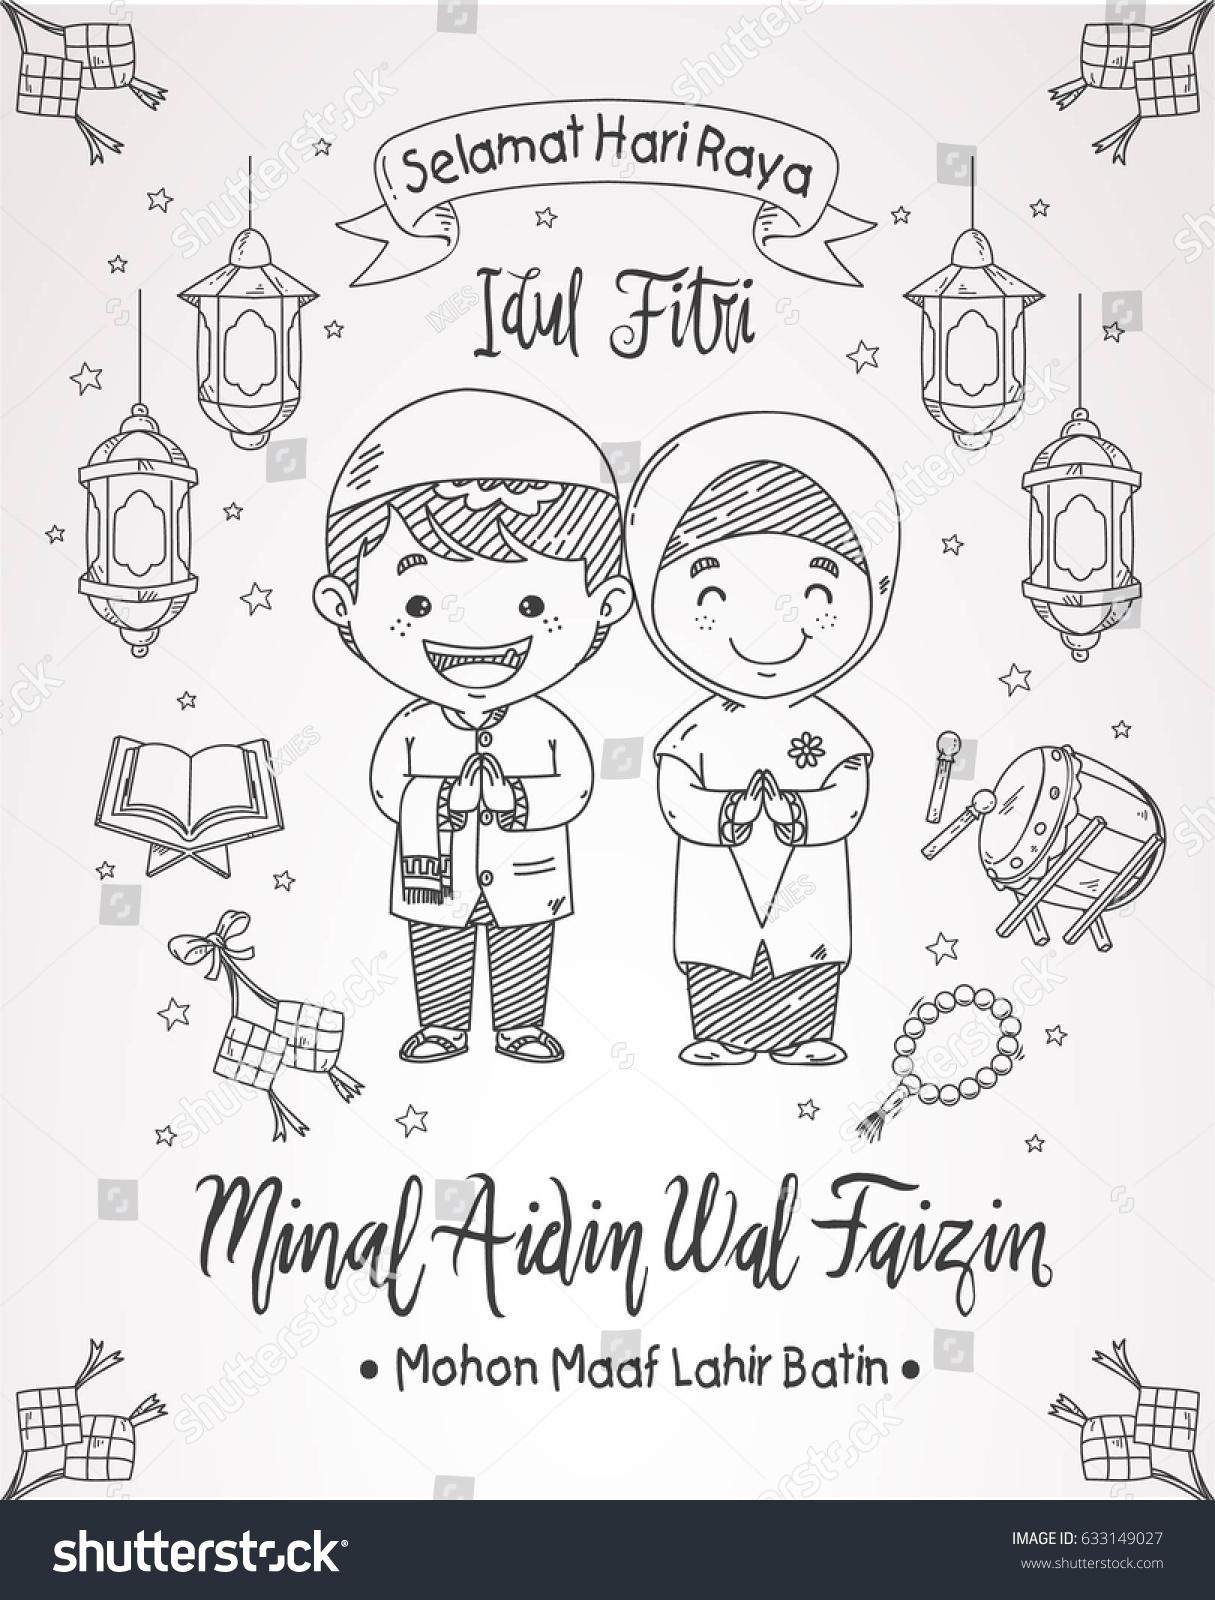 Eid Mubarak Idul Fitri Greeting Card Stock Vector 633149027